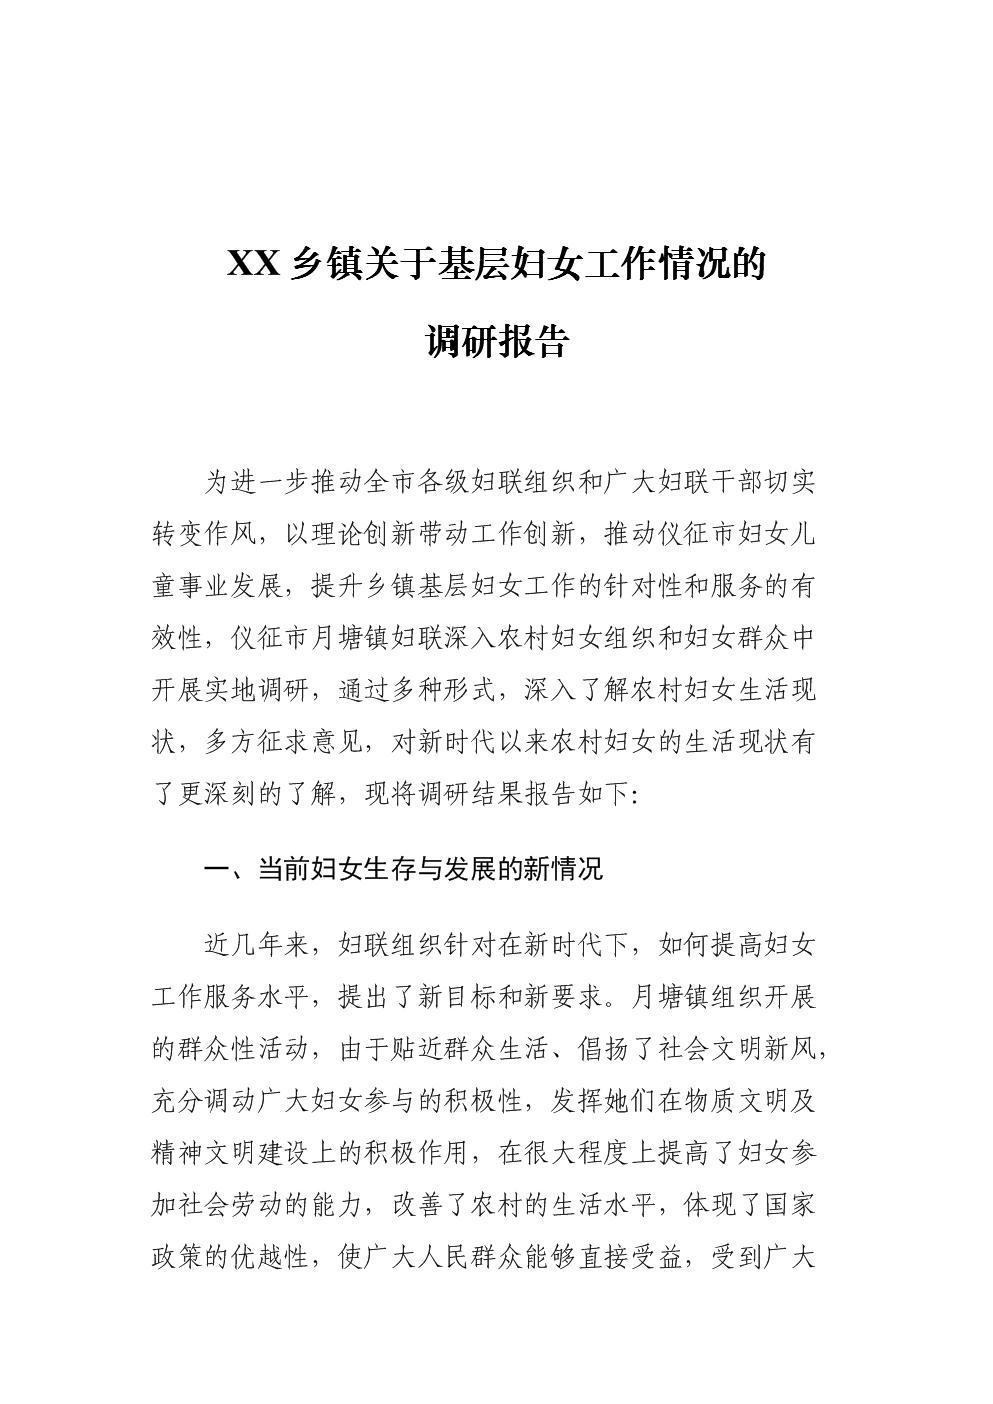 XX乡镇关于基层妇女工作情况的调研报告.docx